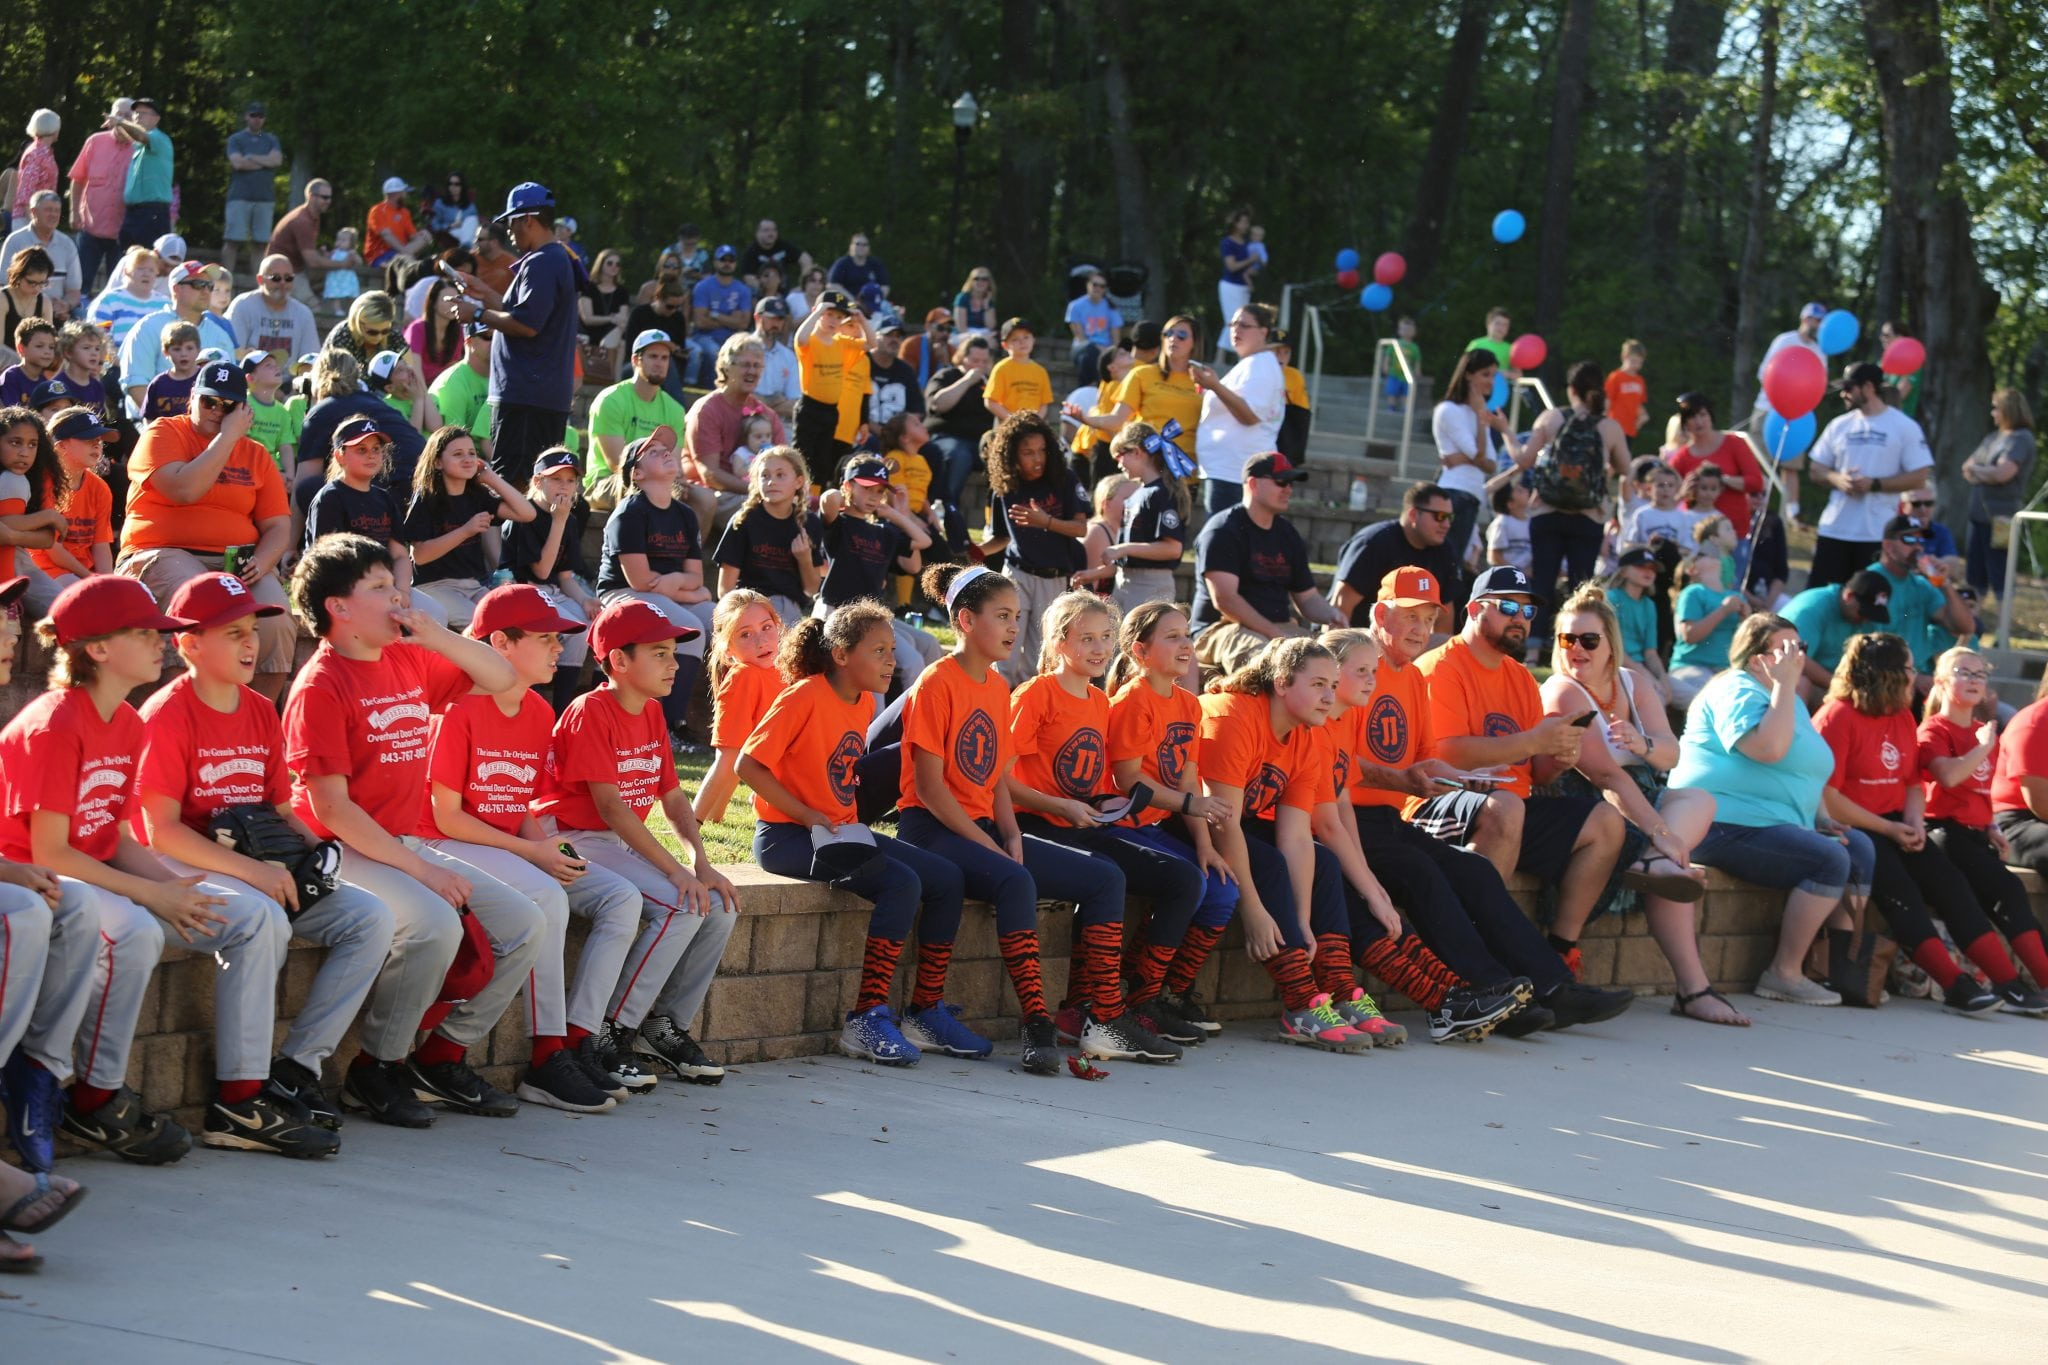 Kids waiting to see their teams